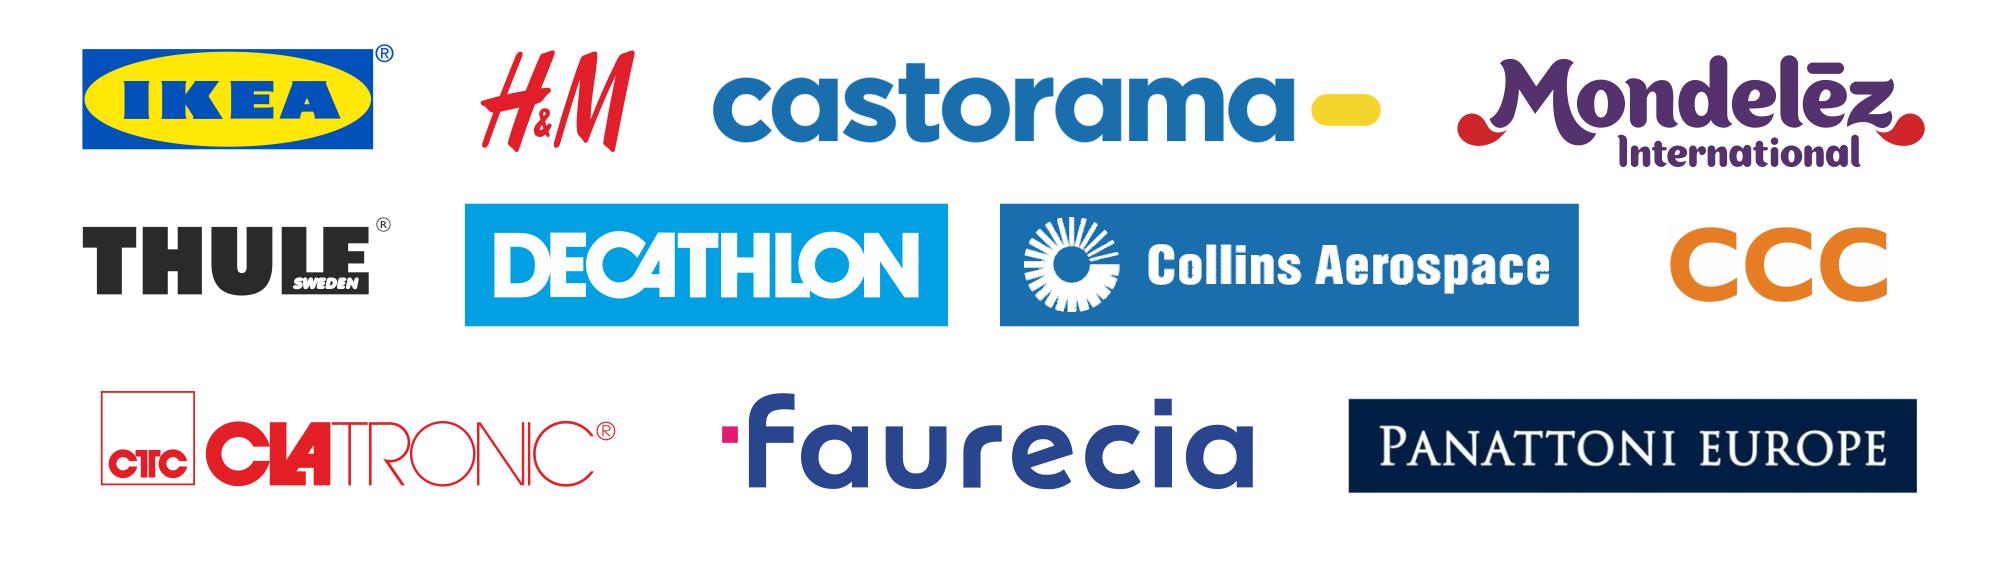 Costumers logos: IKEA, H&M, Castorama, Mondelez, Thule, Decathlon, Collins Aerospace, CCC, Clatronic, Faurecia, Panattoni Europe